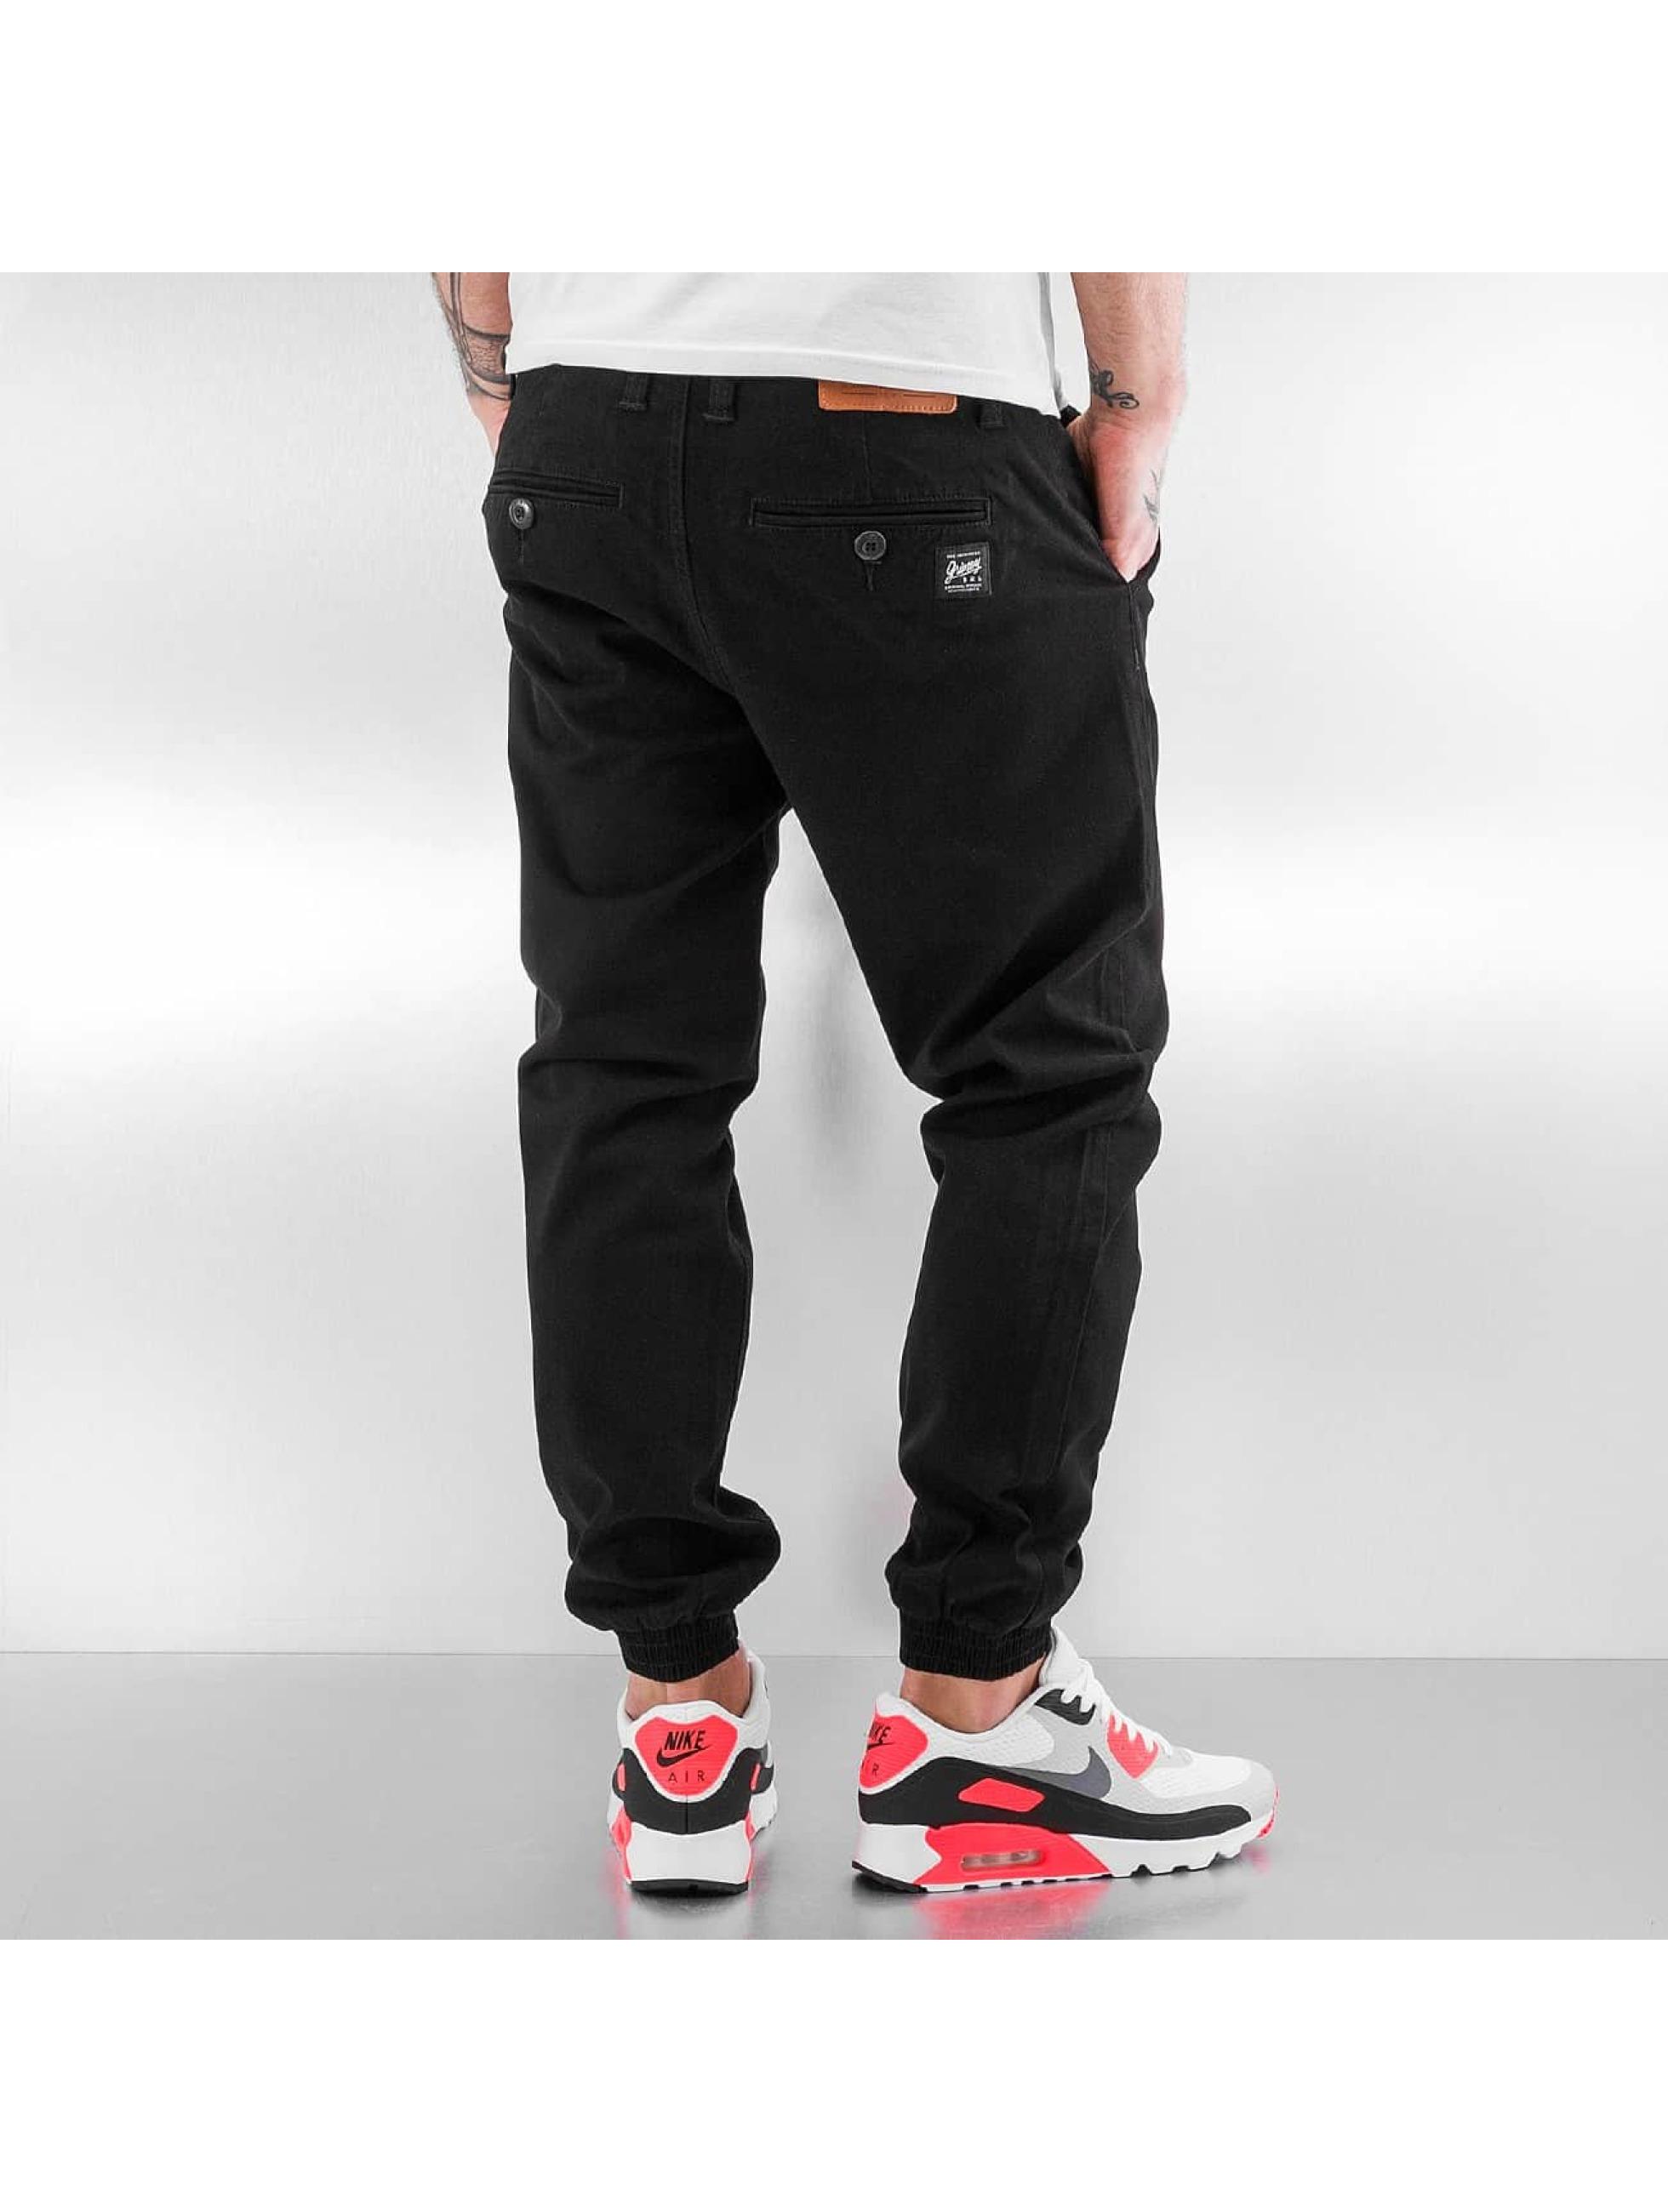 Grimey Wear Pantalone ginnico Twill Peach nero